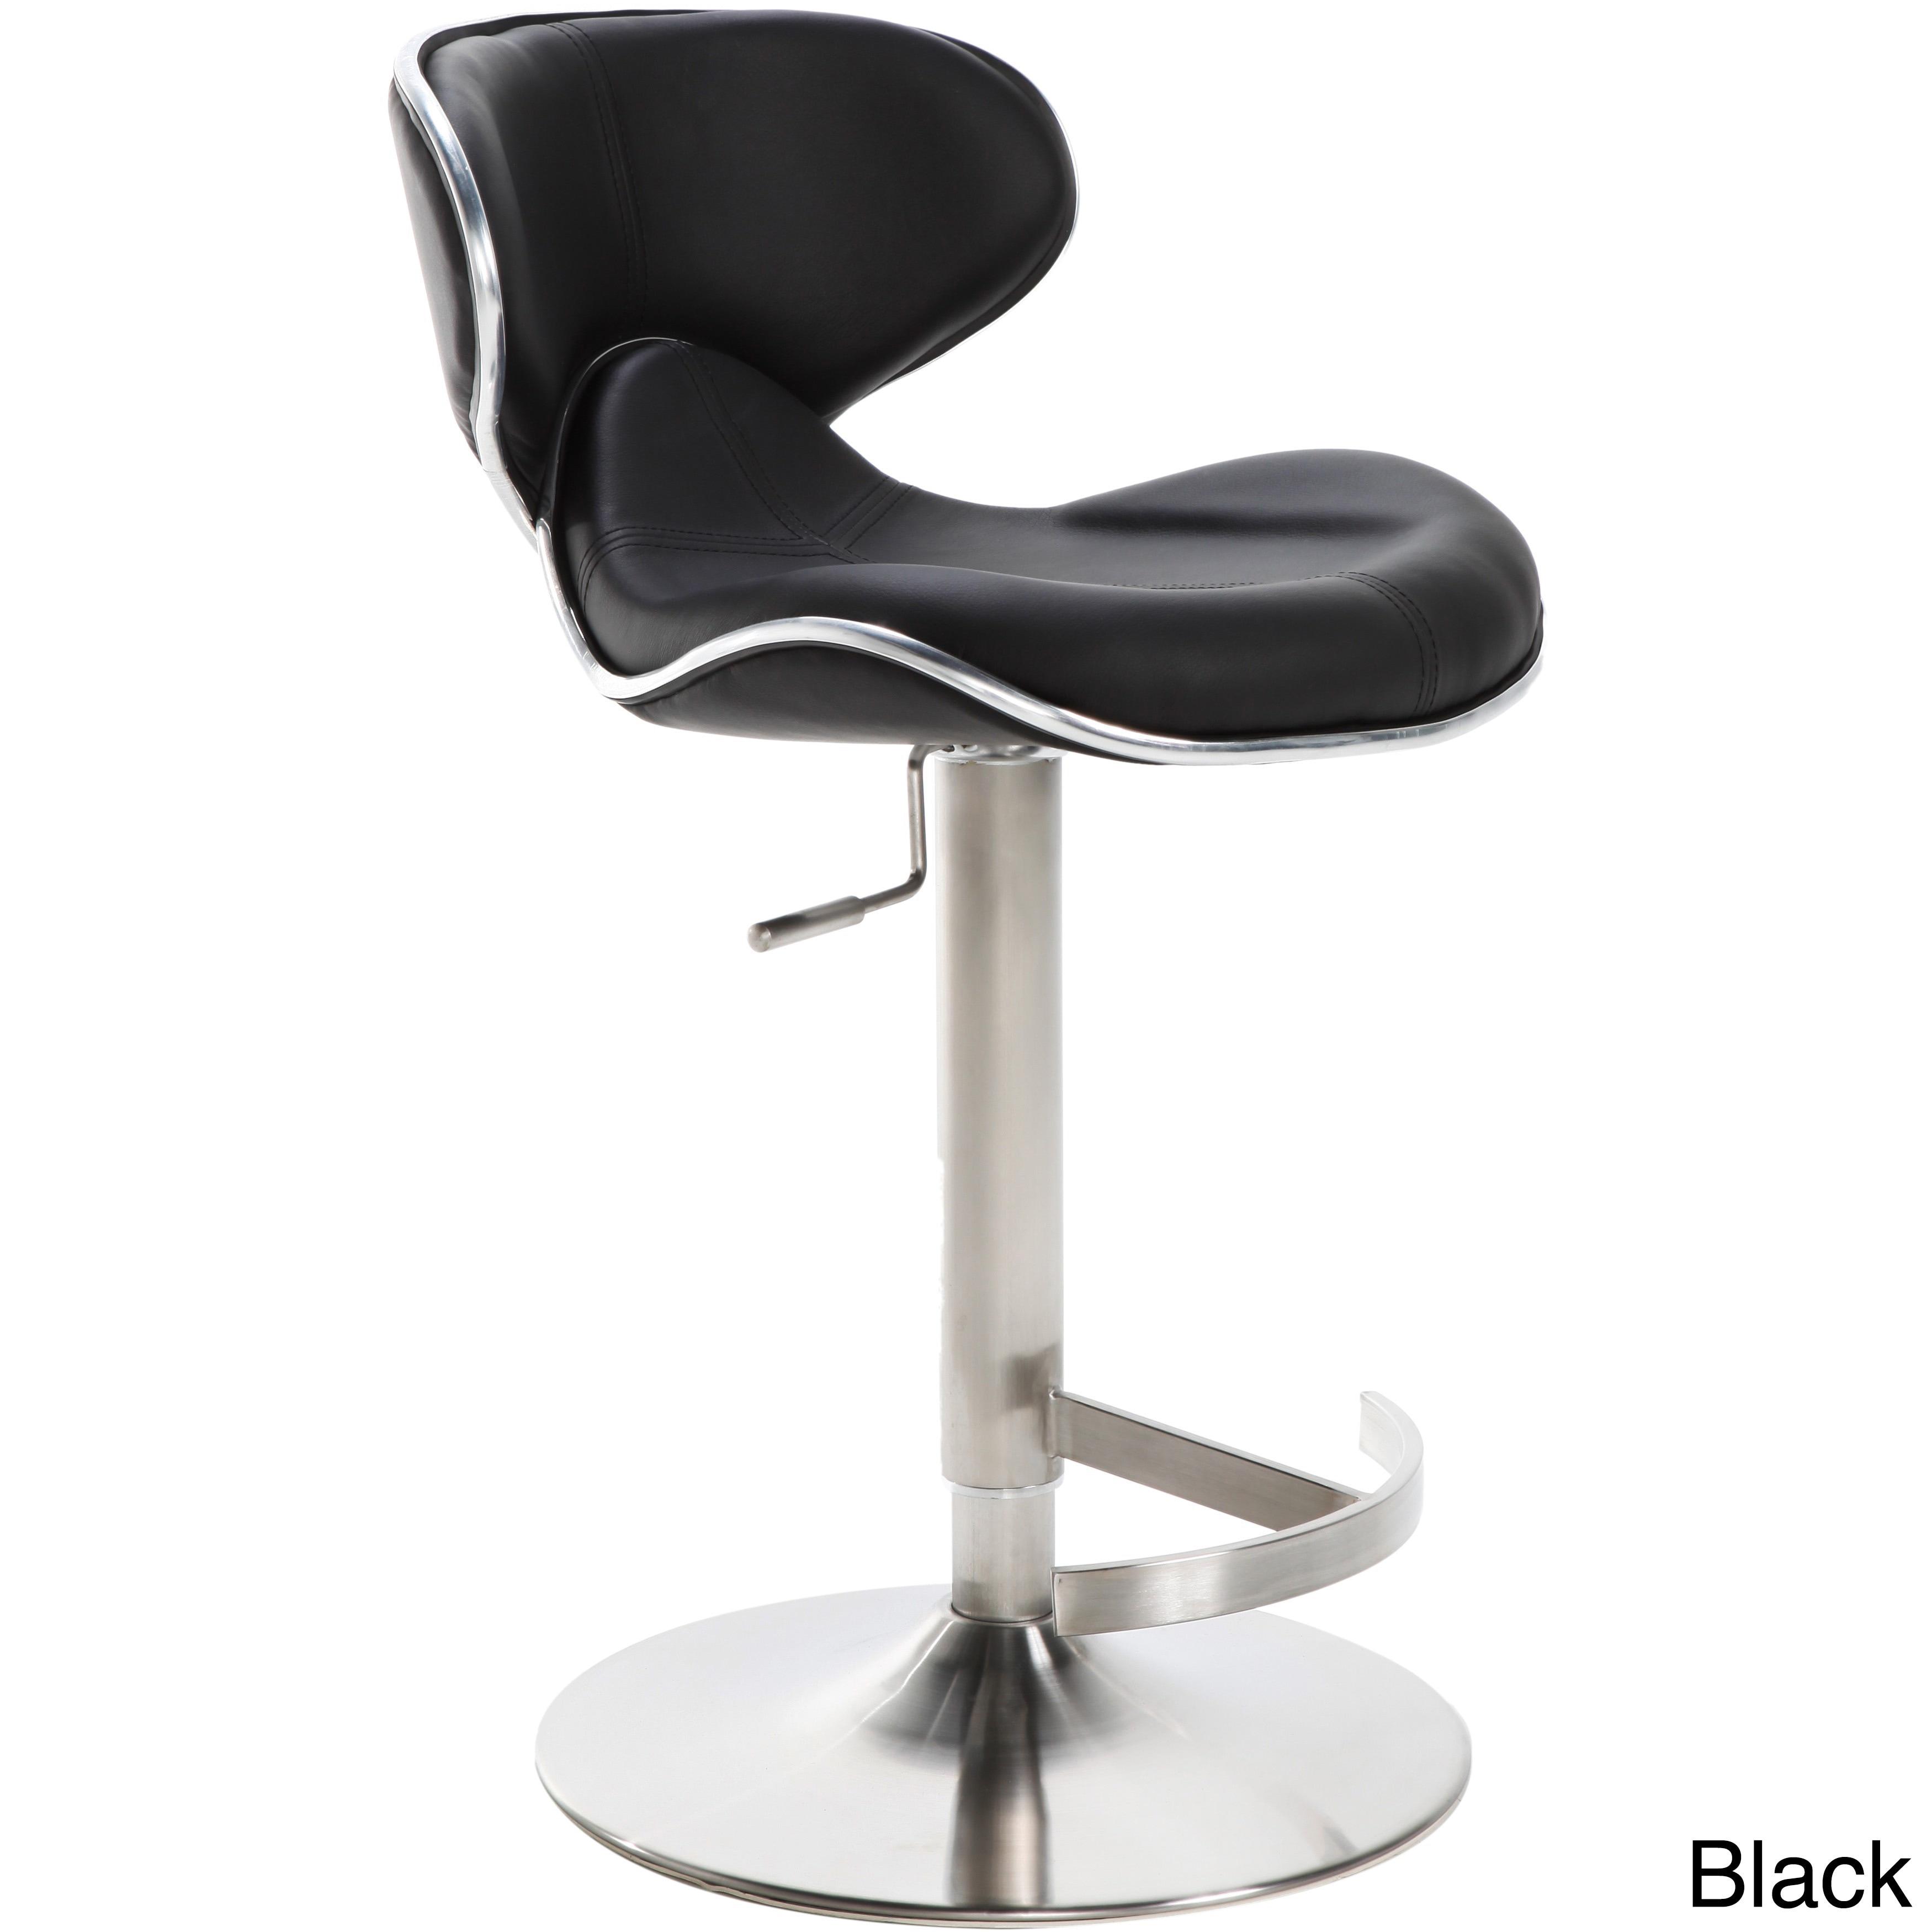 ecco brushed stainless steel adjustable height swivel bar stool  ebay - eccobrushedstainlesssteeladjustableheightswivelbar